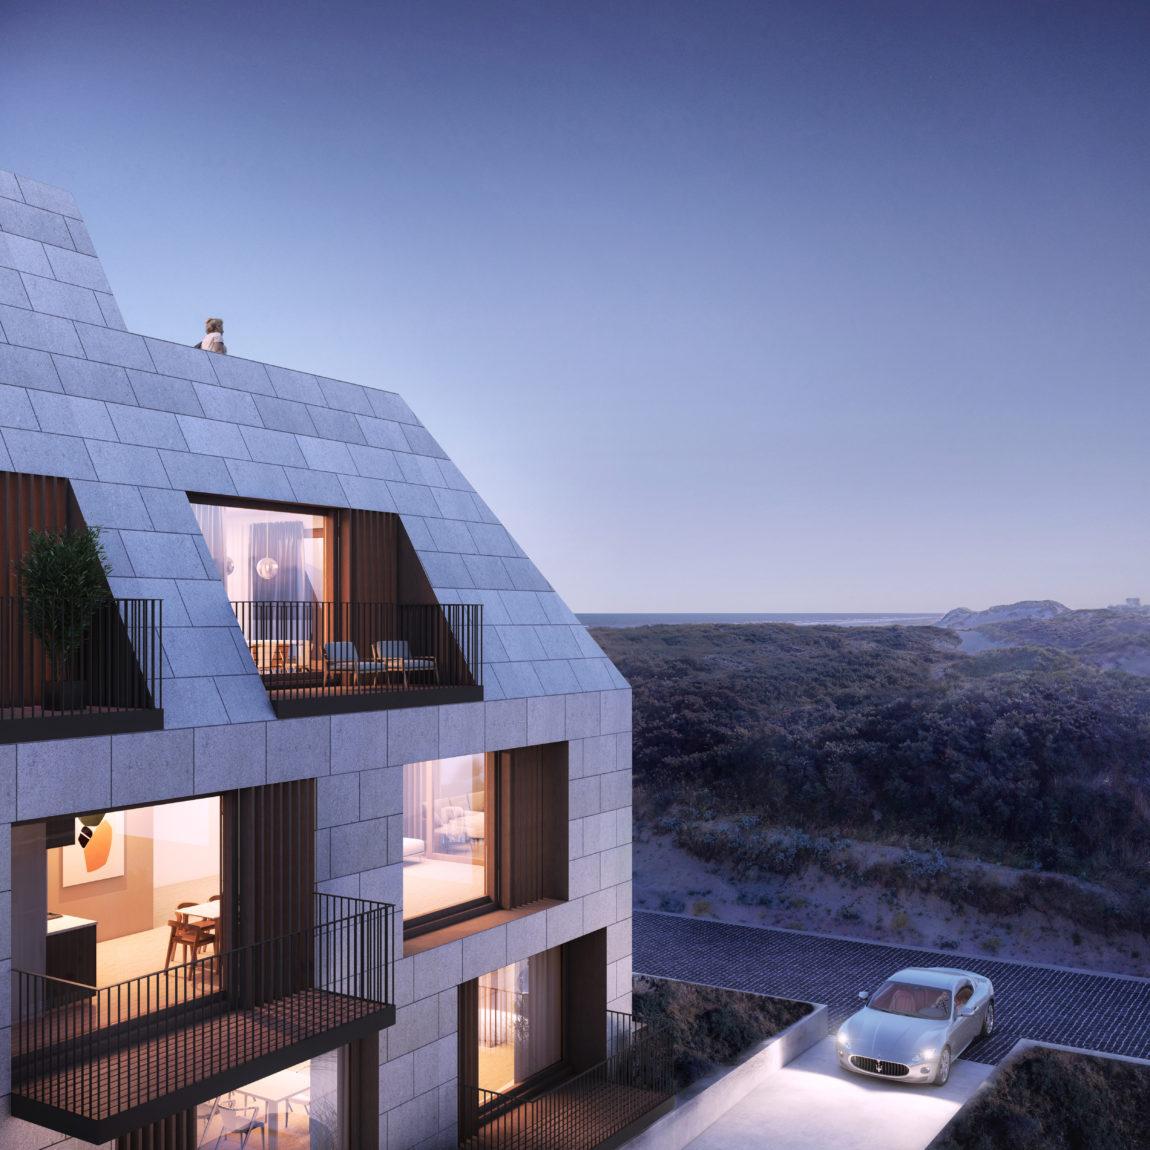 Schröder Koksijde Te koop Rietveldprojects Caan Architecten4 shopped v1